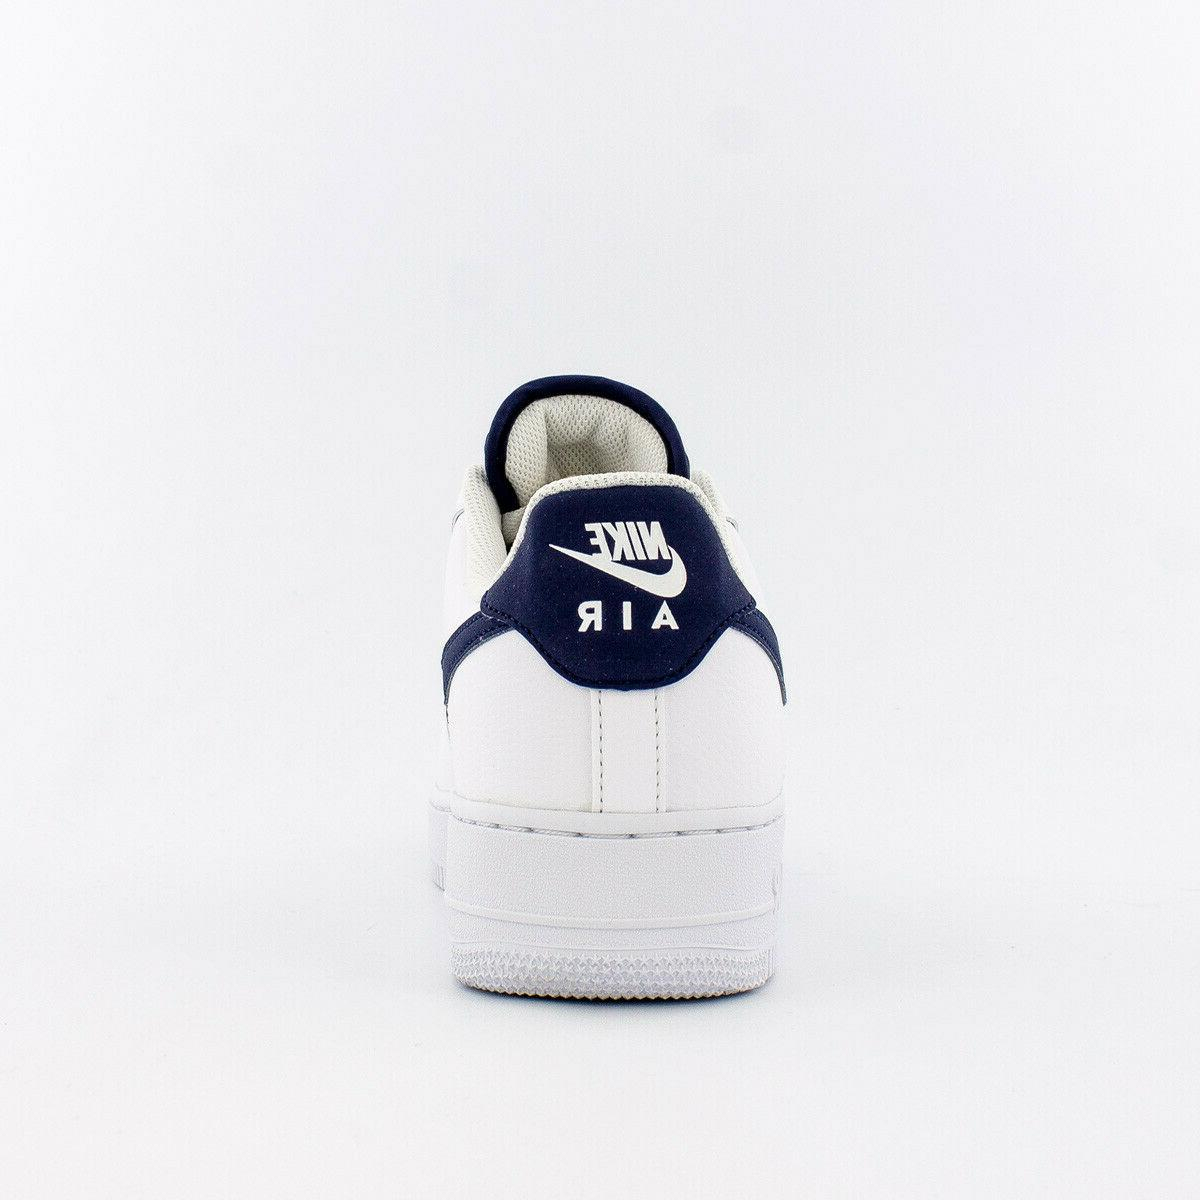 Men's Air 1 '07 Shoes CJ1607-100 White/Navy